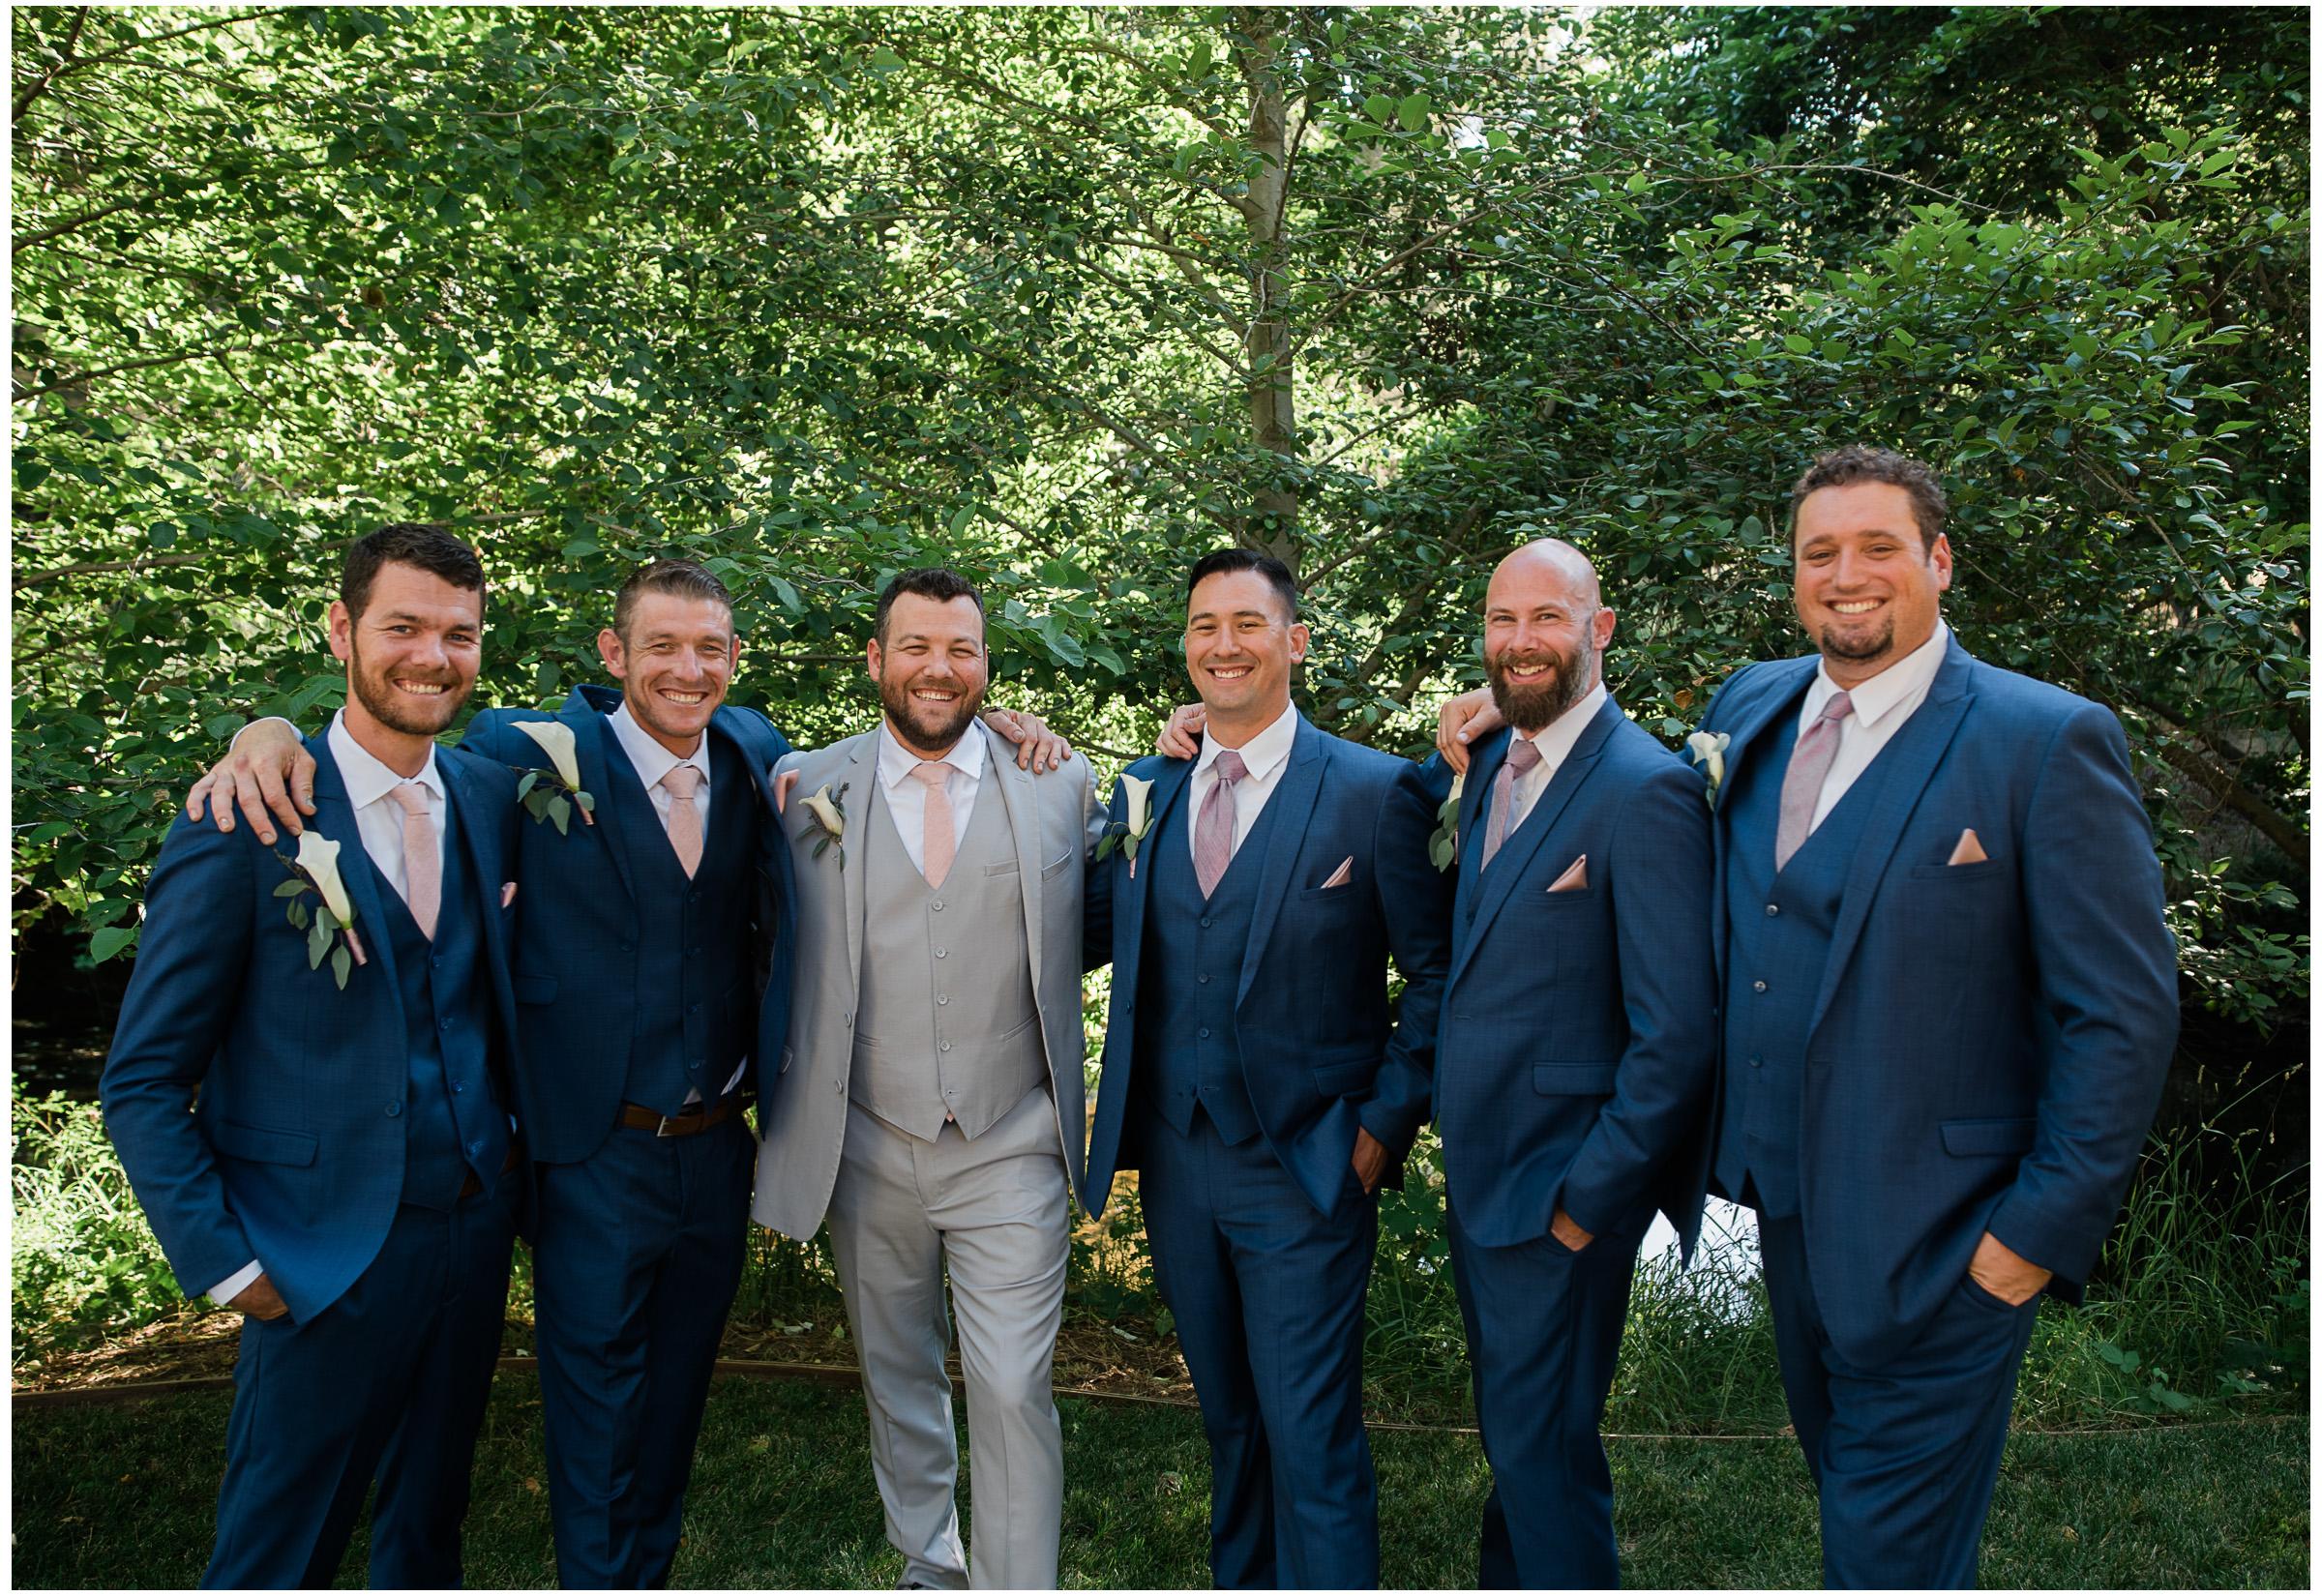 Placerville Wedding - Sacramento Photographer - Justin Wilcox Photography - 12.jpg